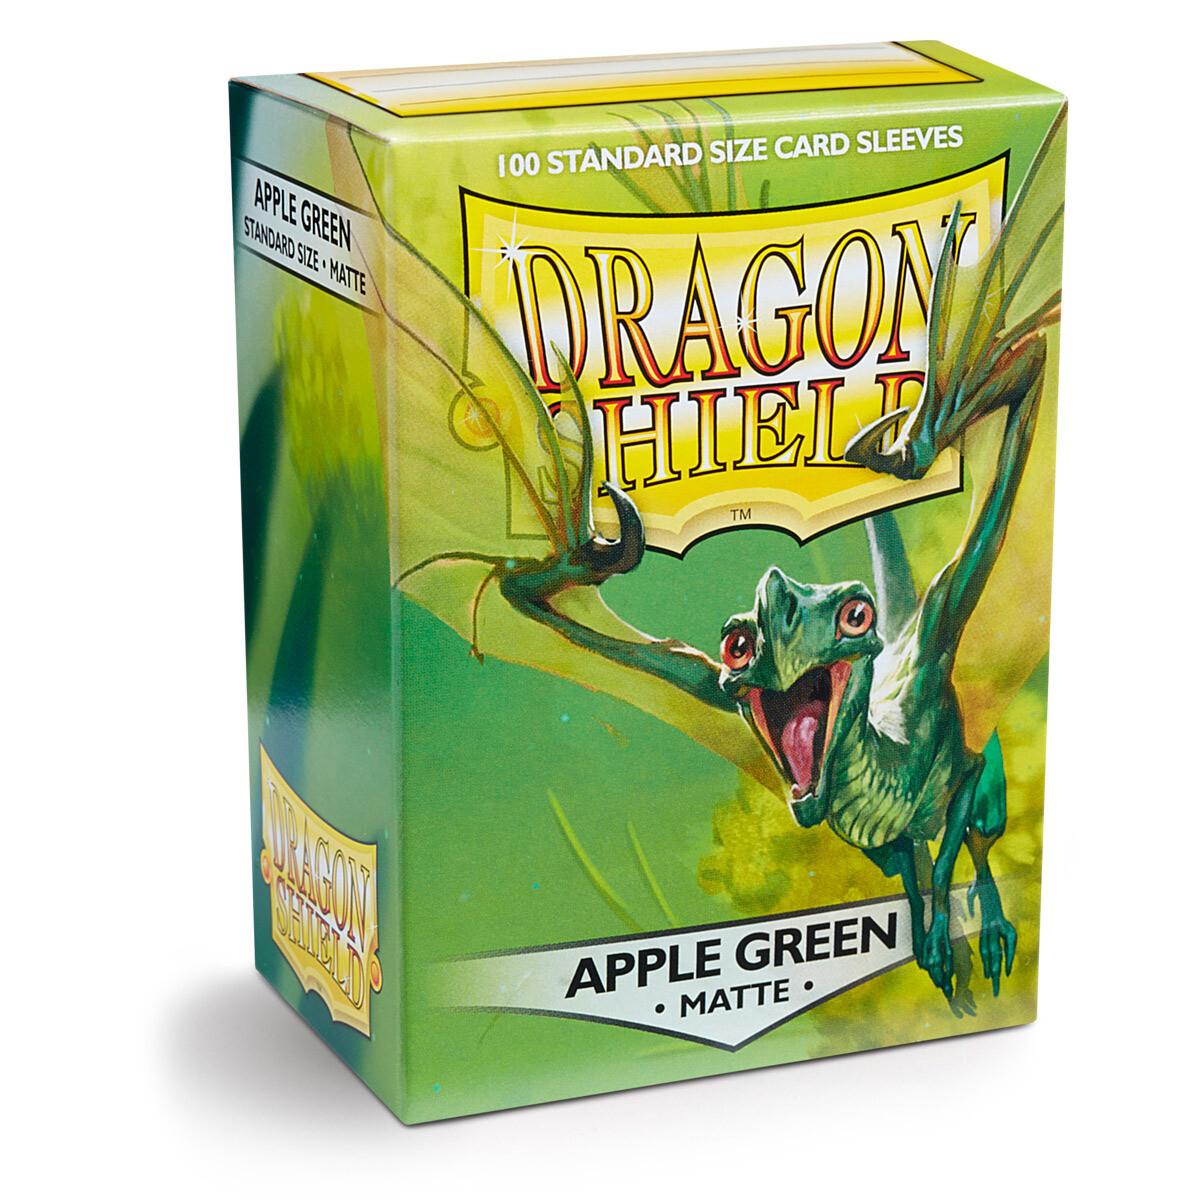 Dragon Shield 100 Sleeves - Matte Apple Green